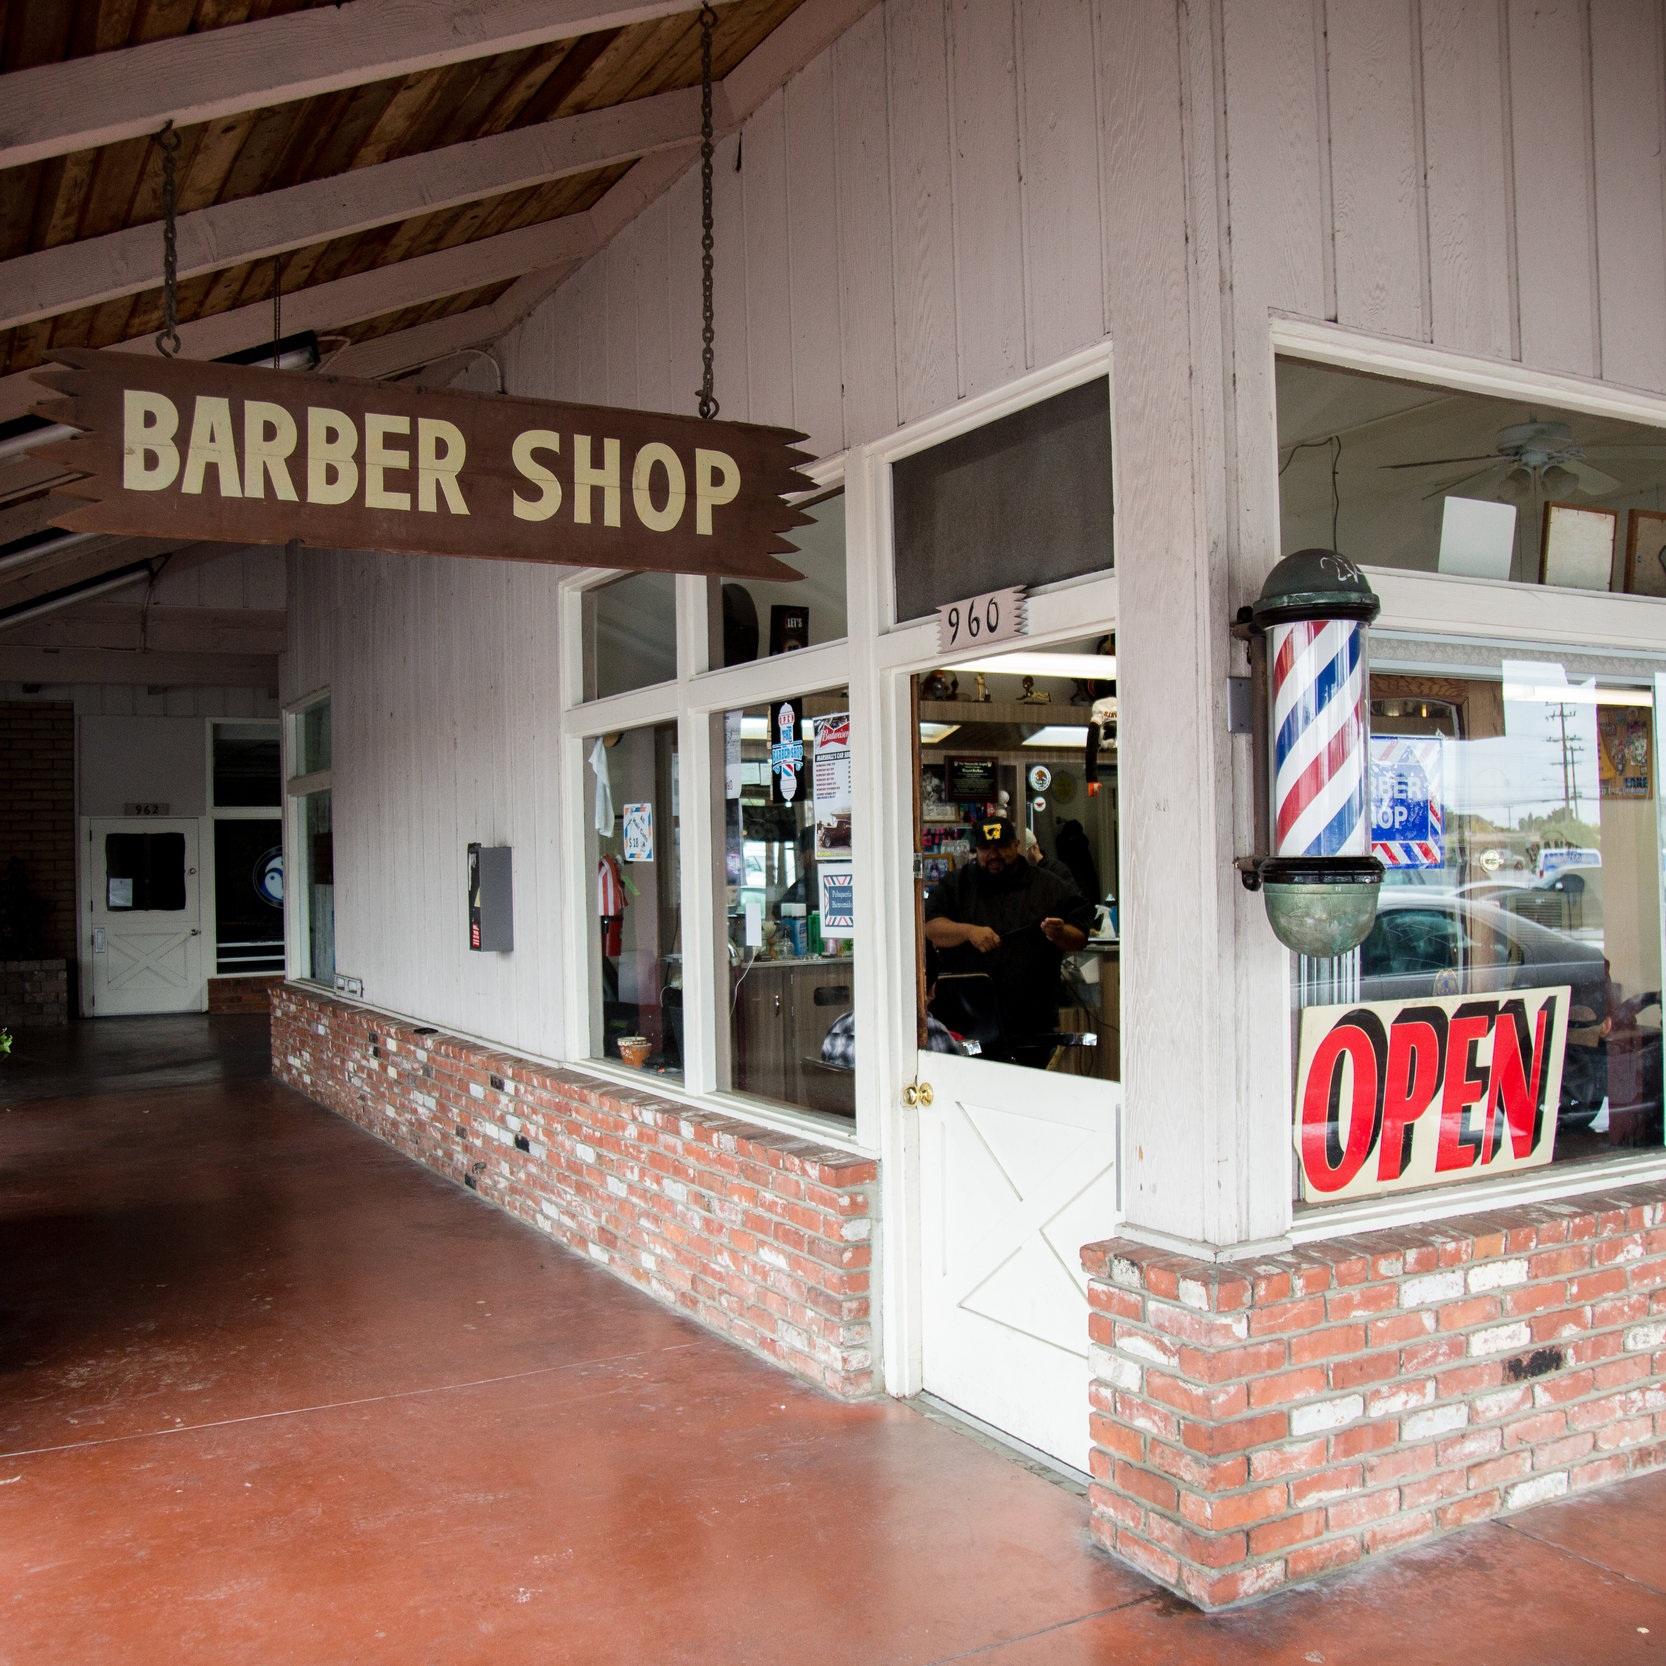 Bud's Barber Shop   960 E Lake Ave, Watsonville, CA 95076 P.(831) 763-0723